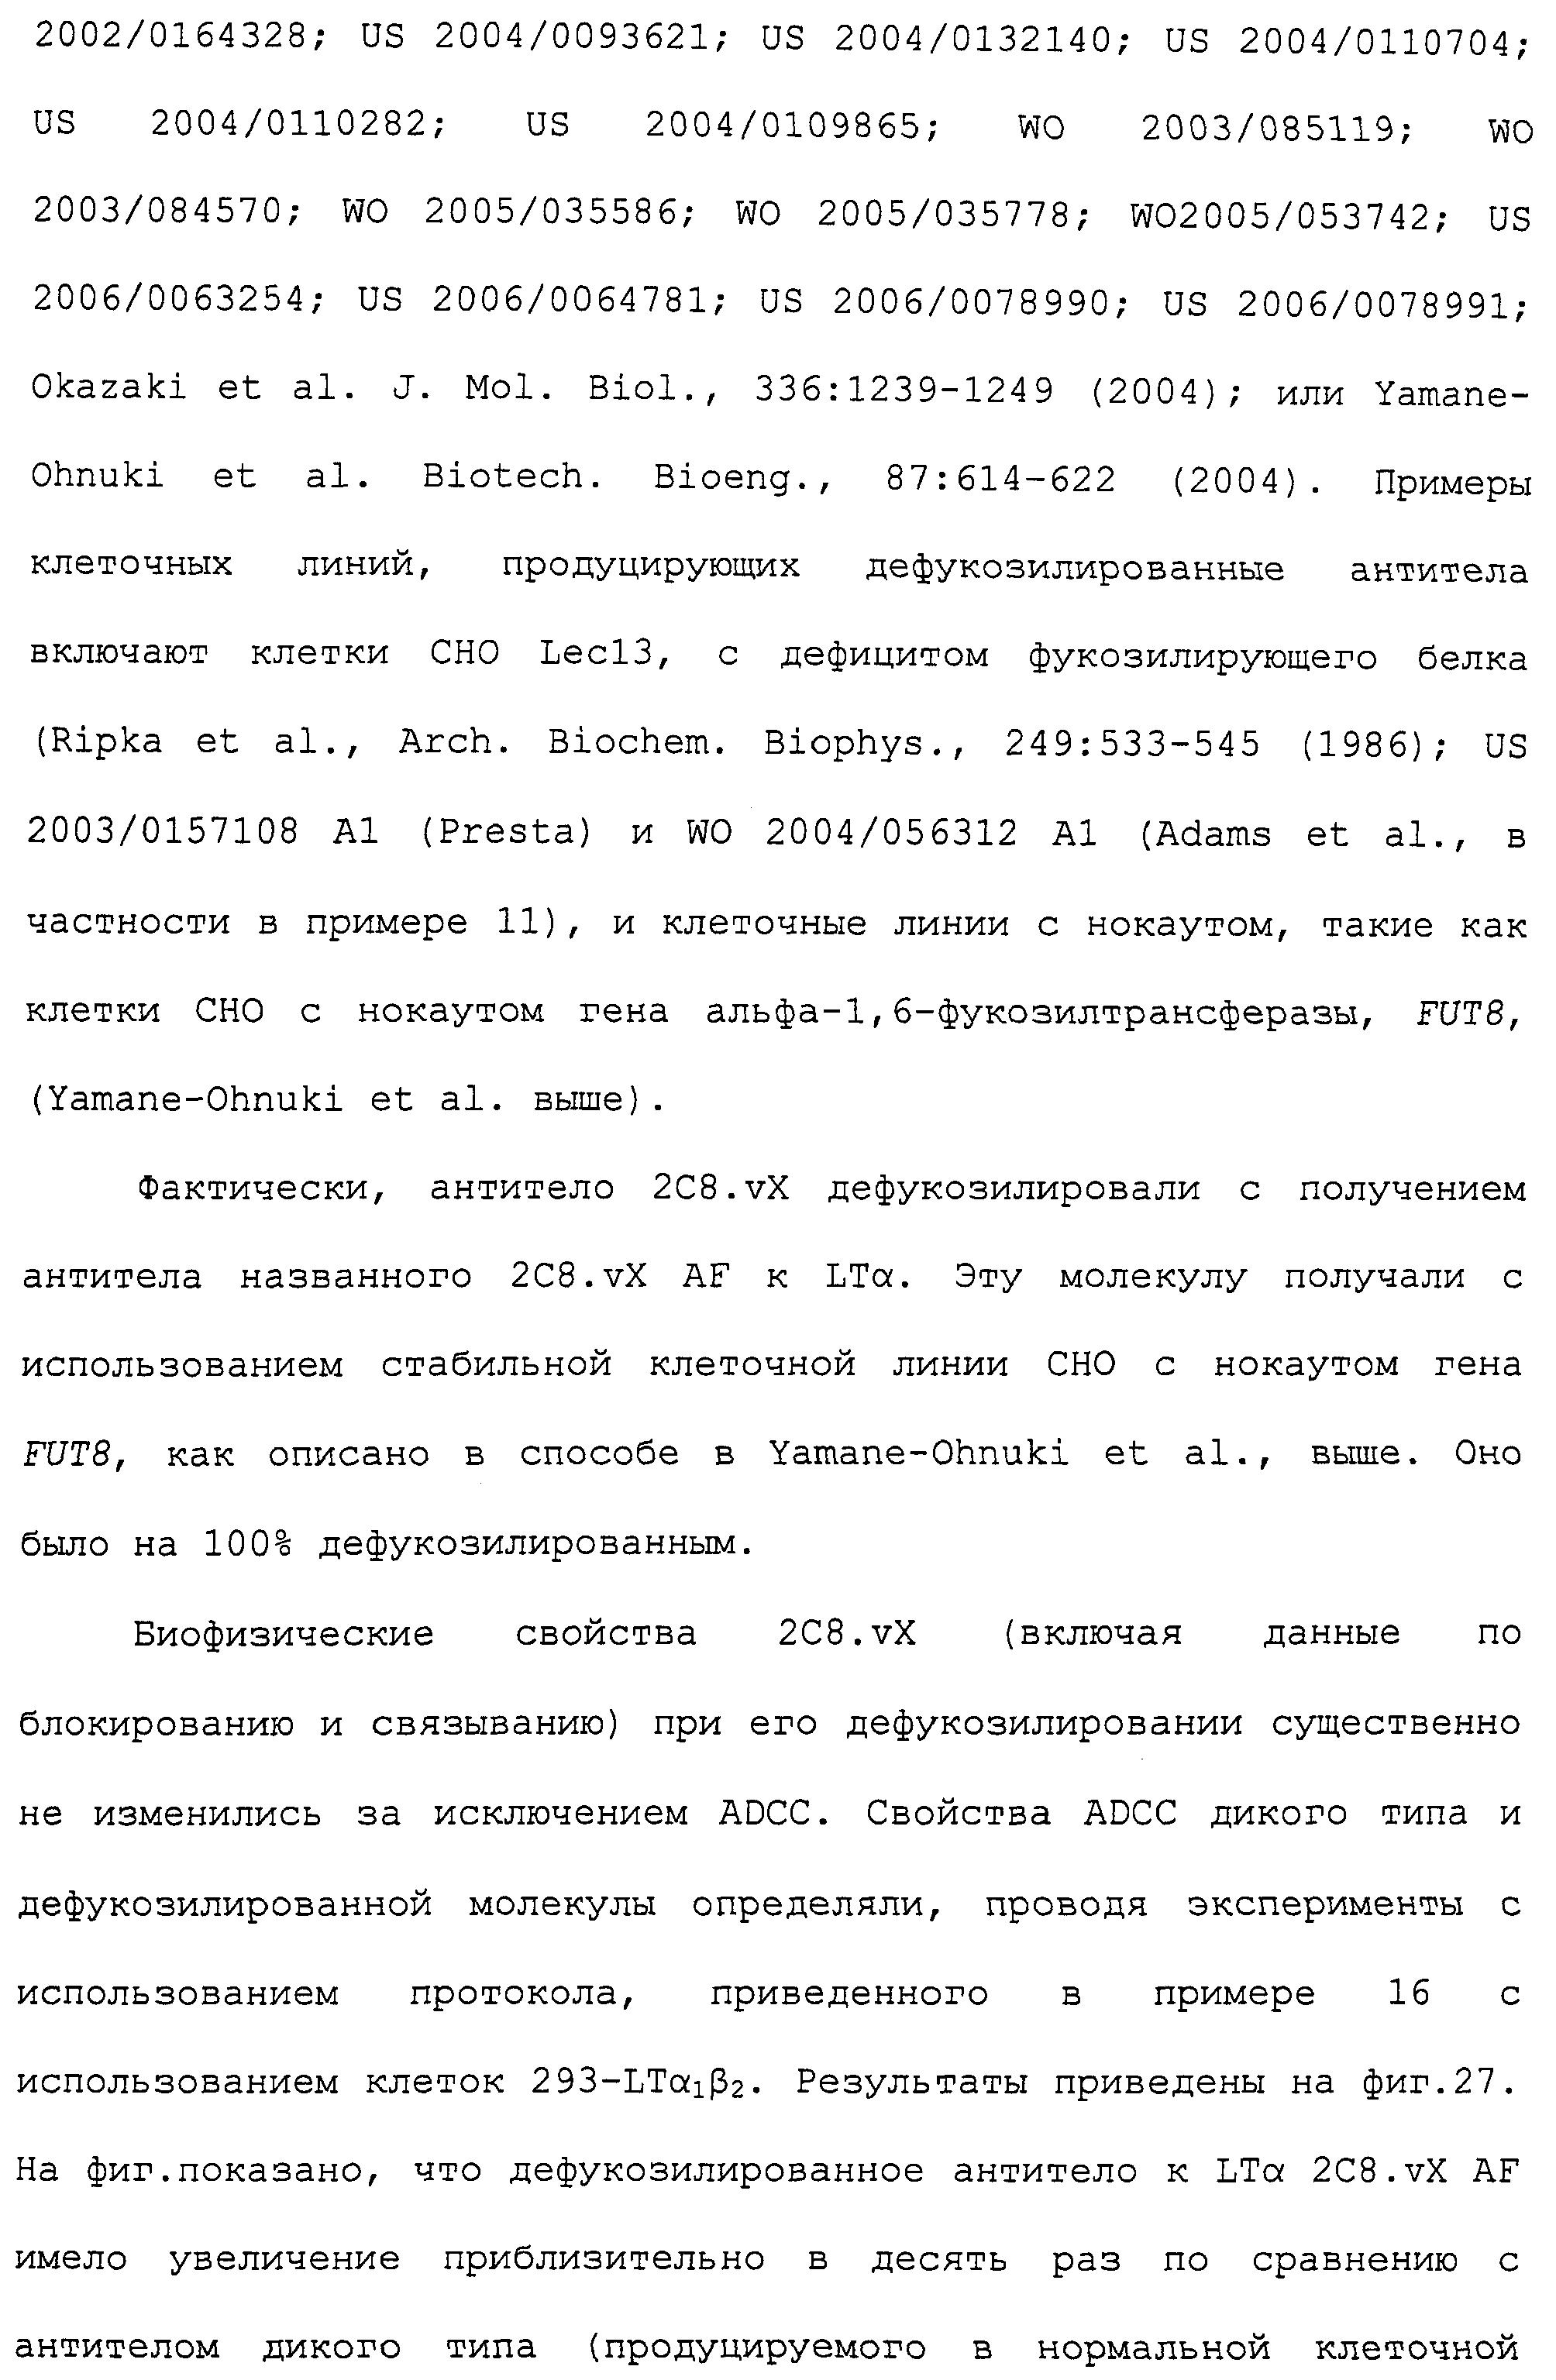 Figure 00000282